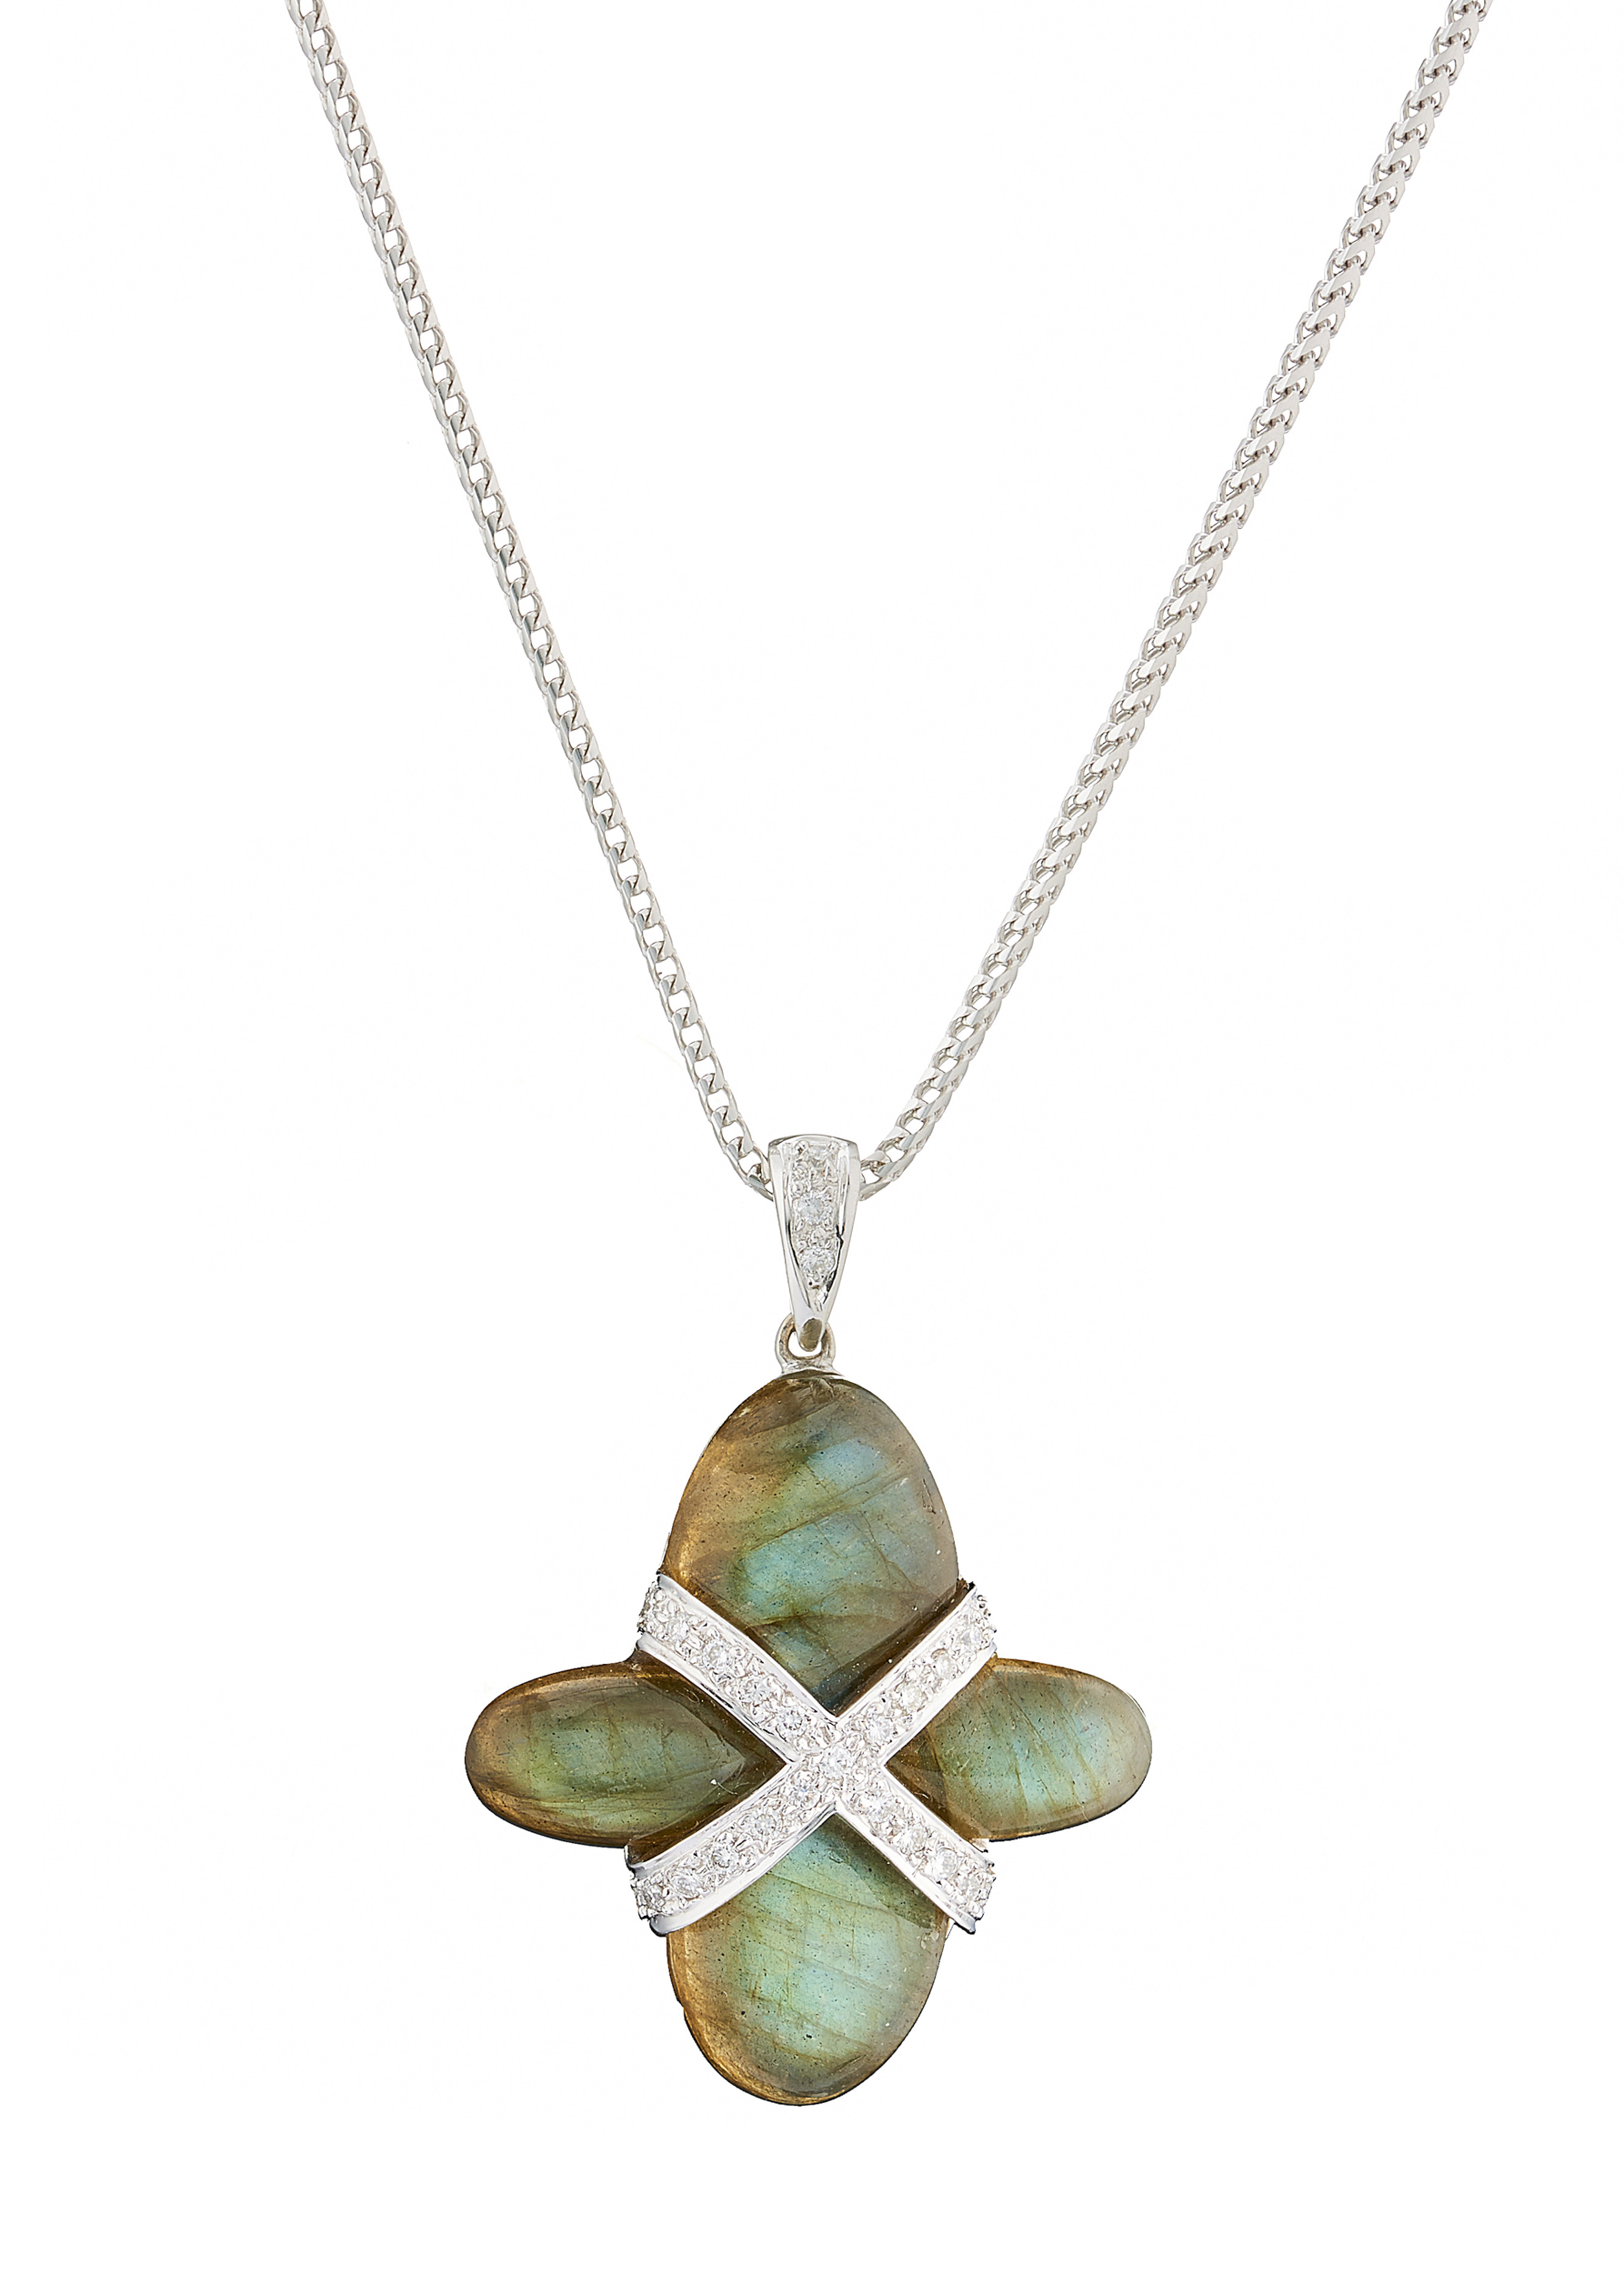 An 18ct gold labradorite and diamond cross necklace